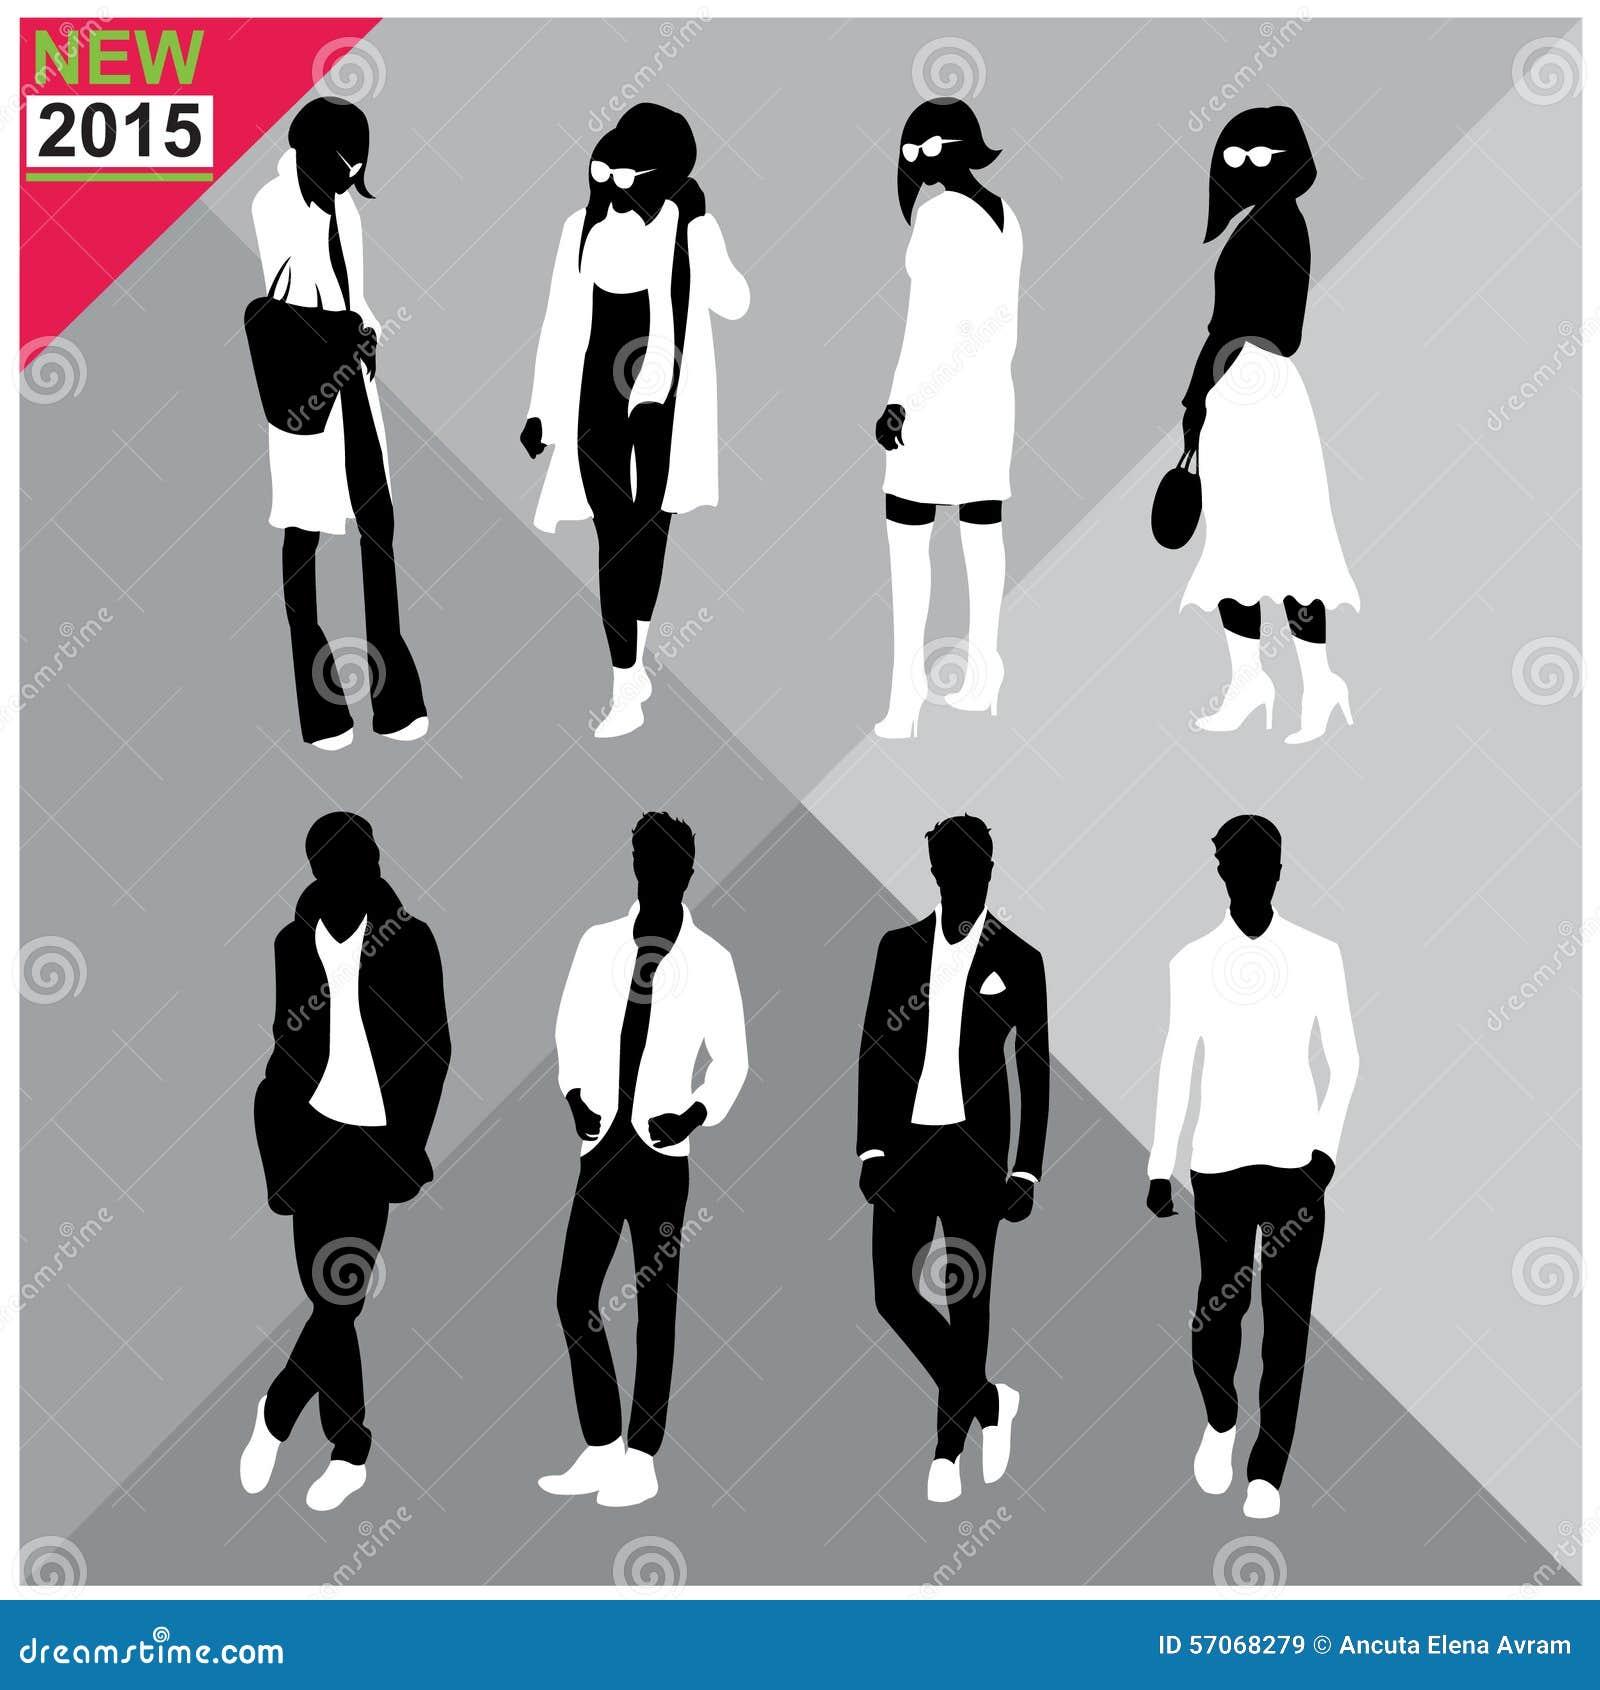 Black Silhouettes Of Men And Womenautumnfallsummer Attireoutfit